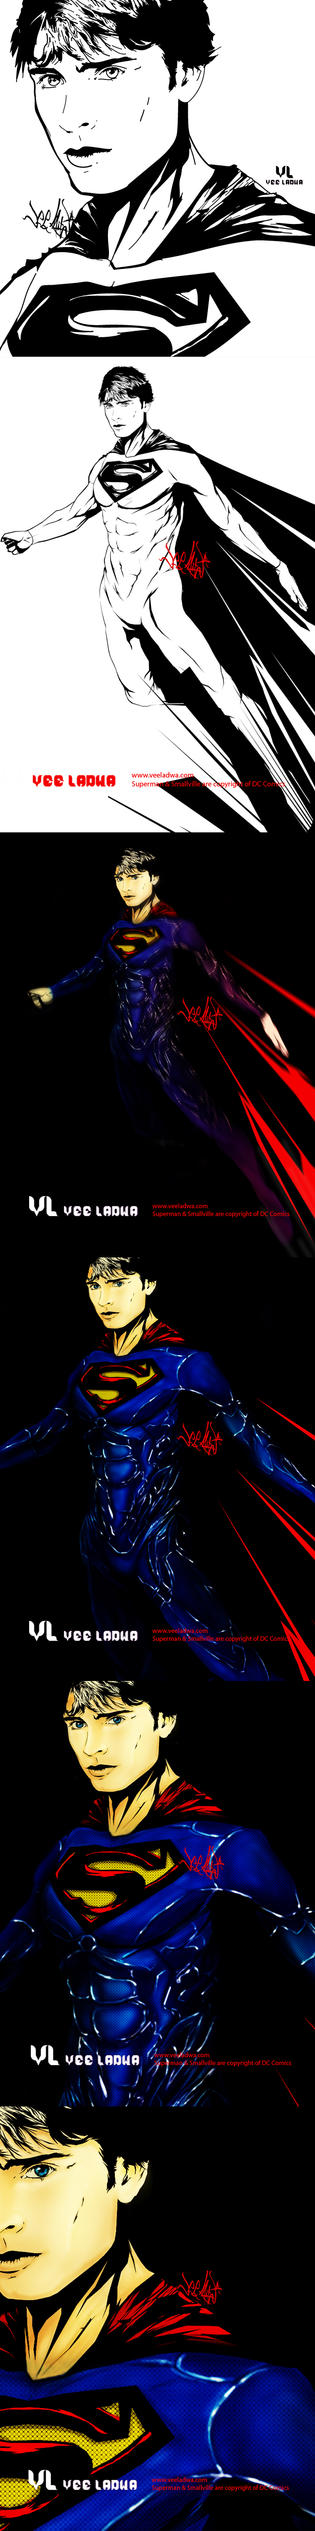 SUPER WELLING by VeeEL